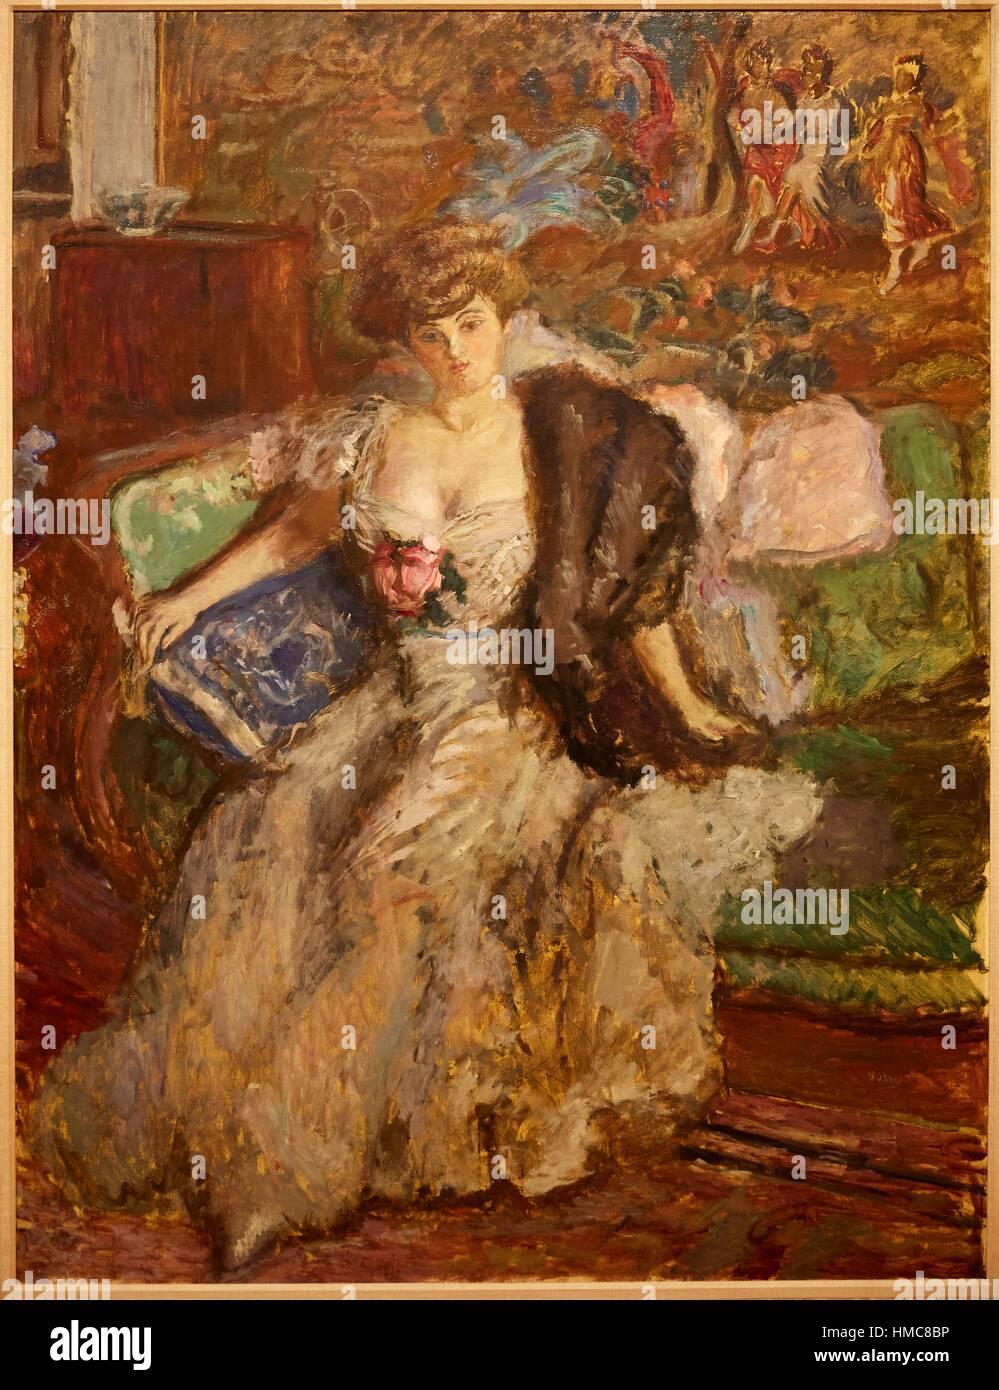 '''Misia Godebska'', 1908, Pierre Bonnard, Thyssen-Bornemisza Museum, Madrid, Spain - Stock Image